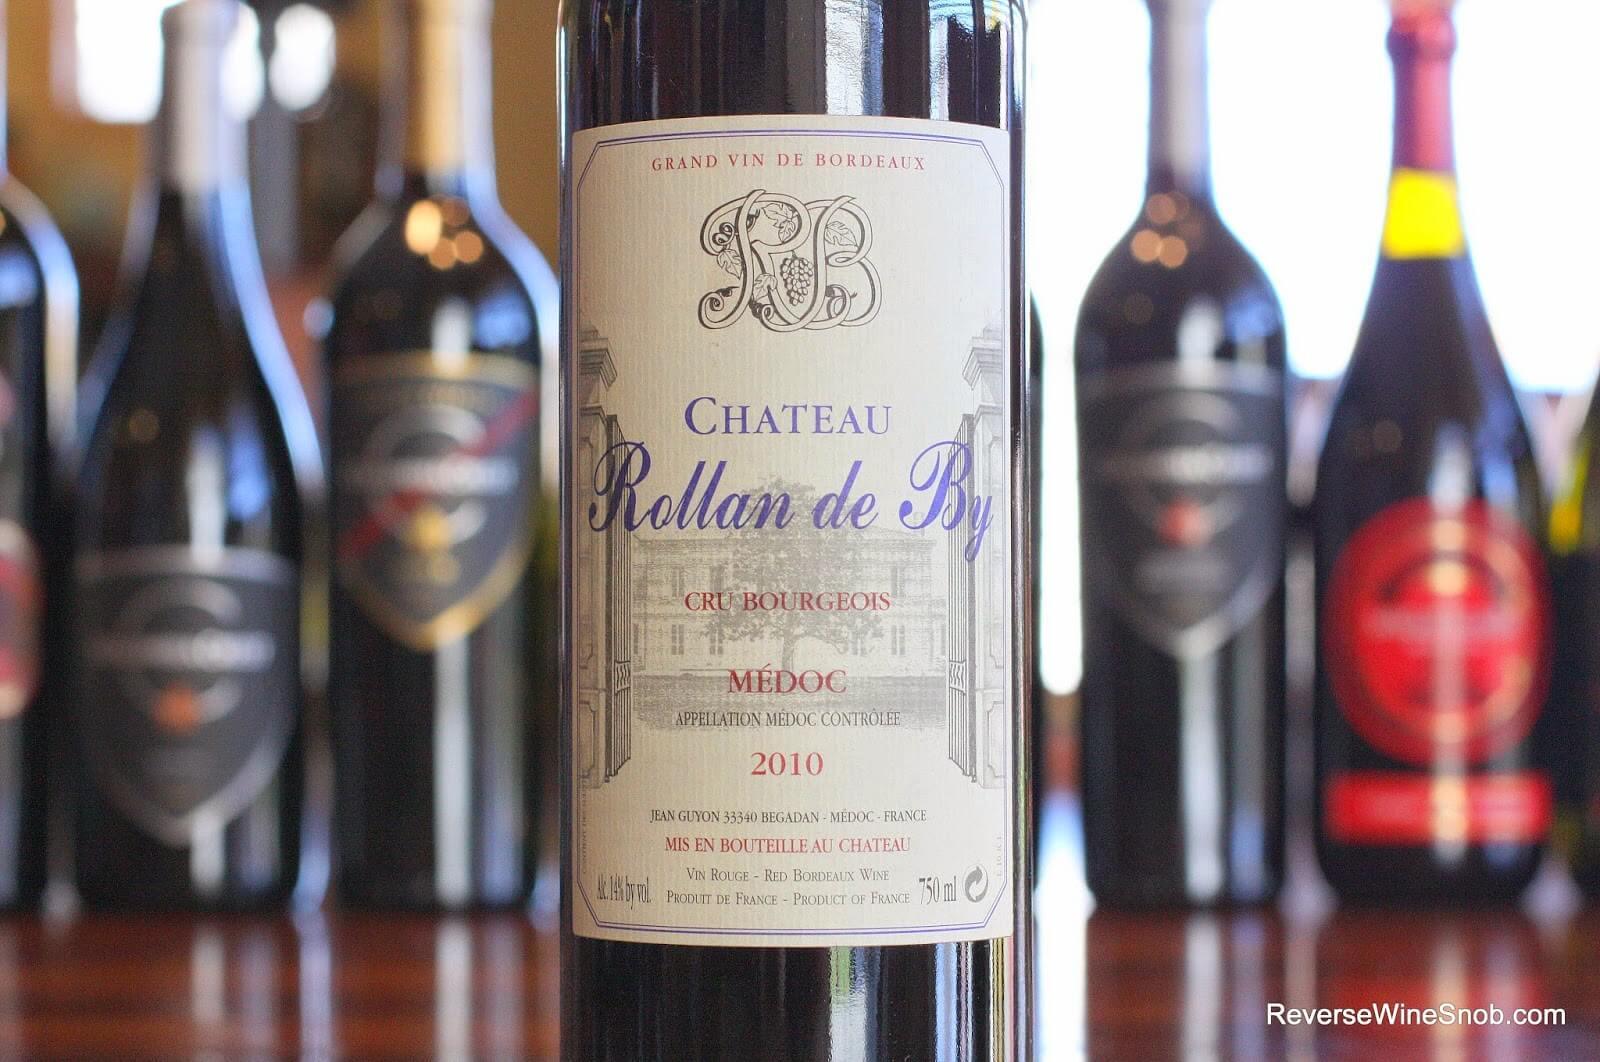 2010-Chateau-Rollan-De-By-Cru-Bourgeois-Medoc-Bordeaux